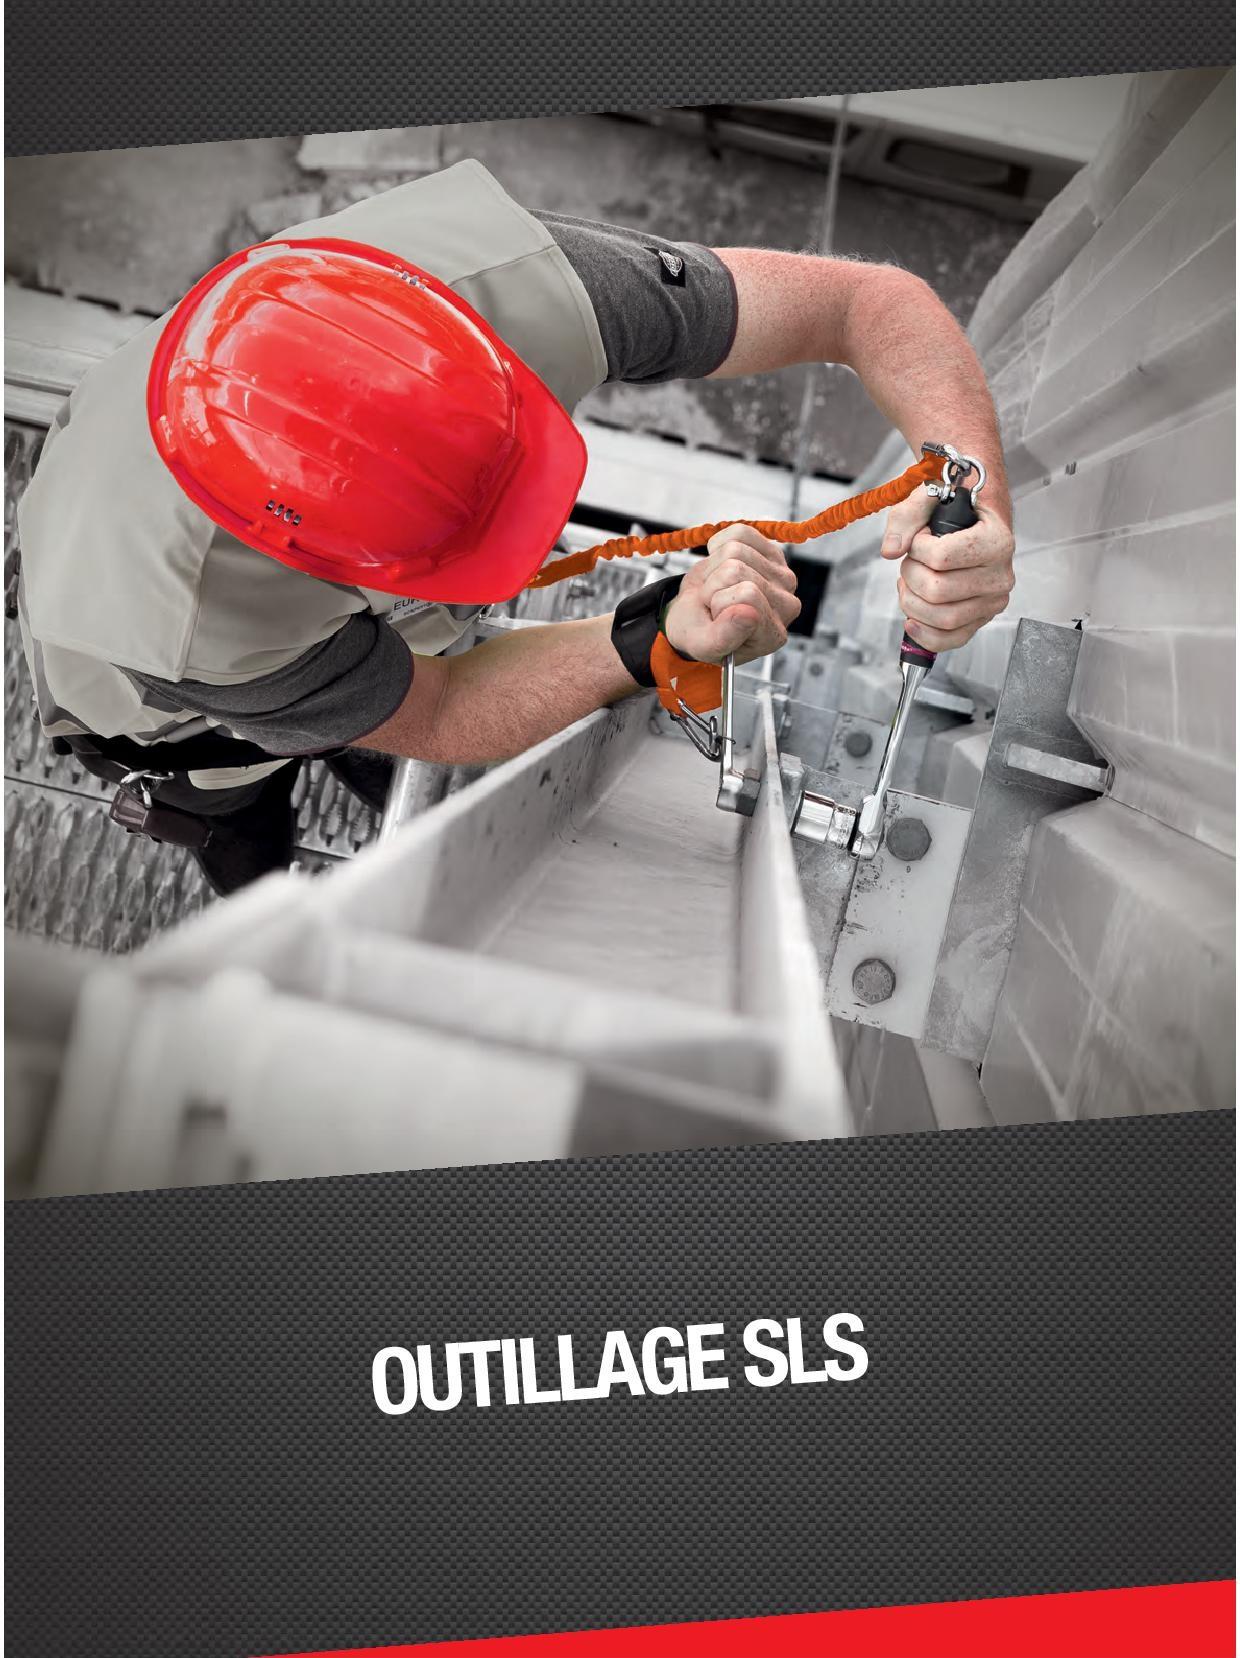 OUTILLAGE SLS